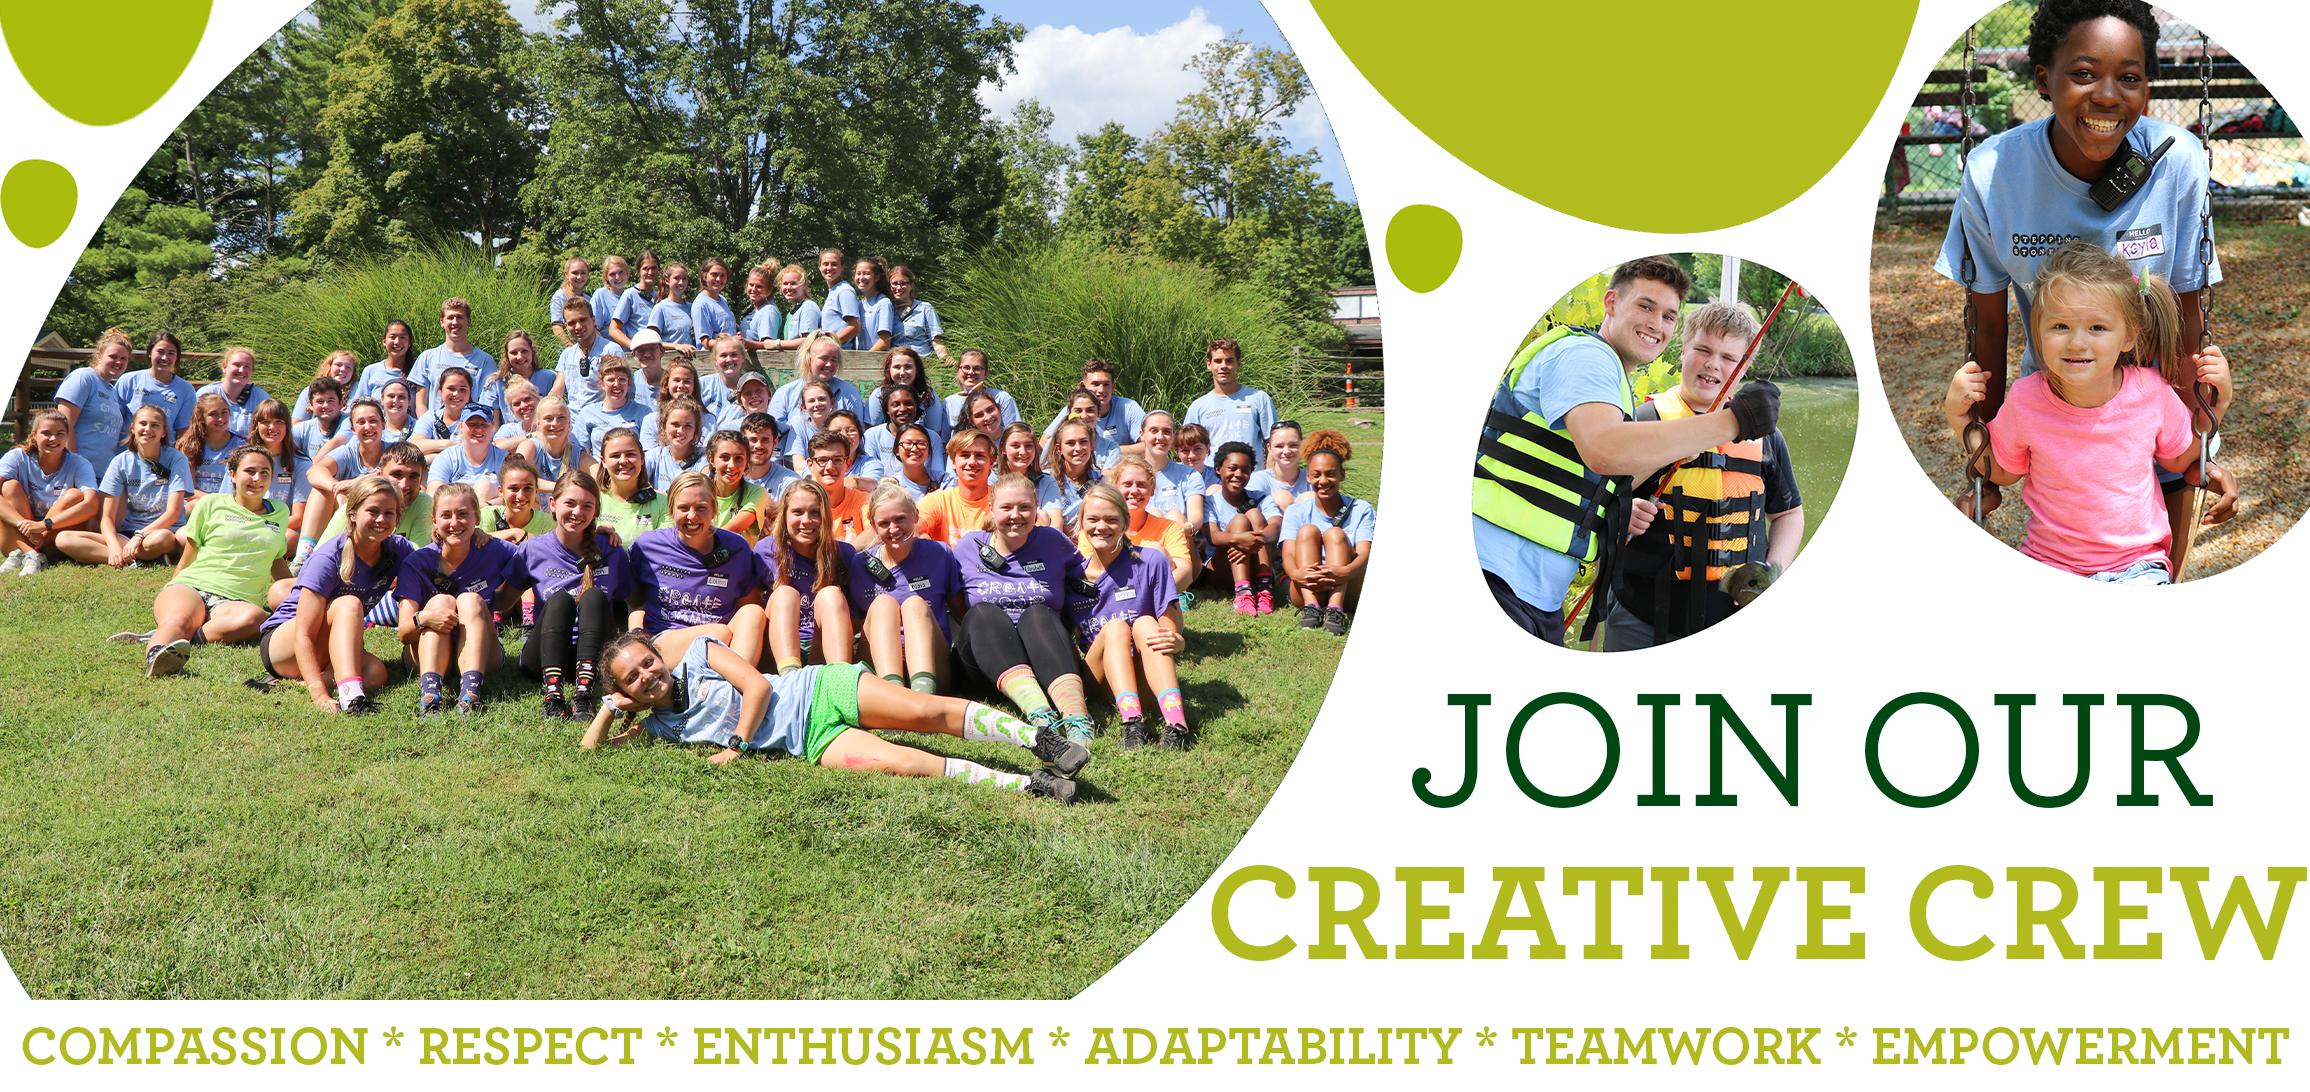 Summer Day Camp Job Openings I Greater Cincinnati